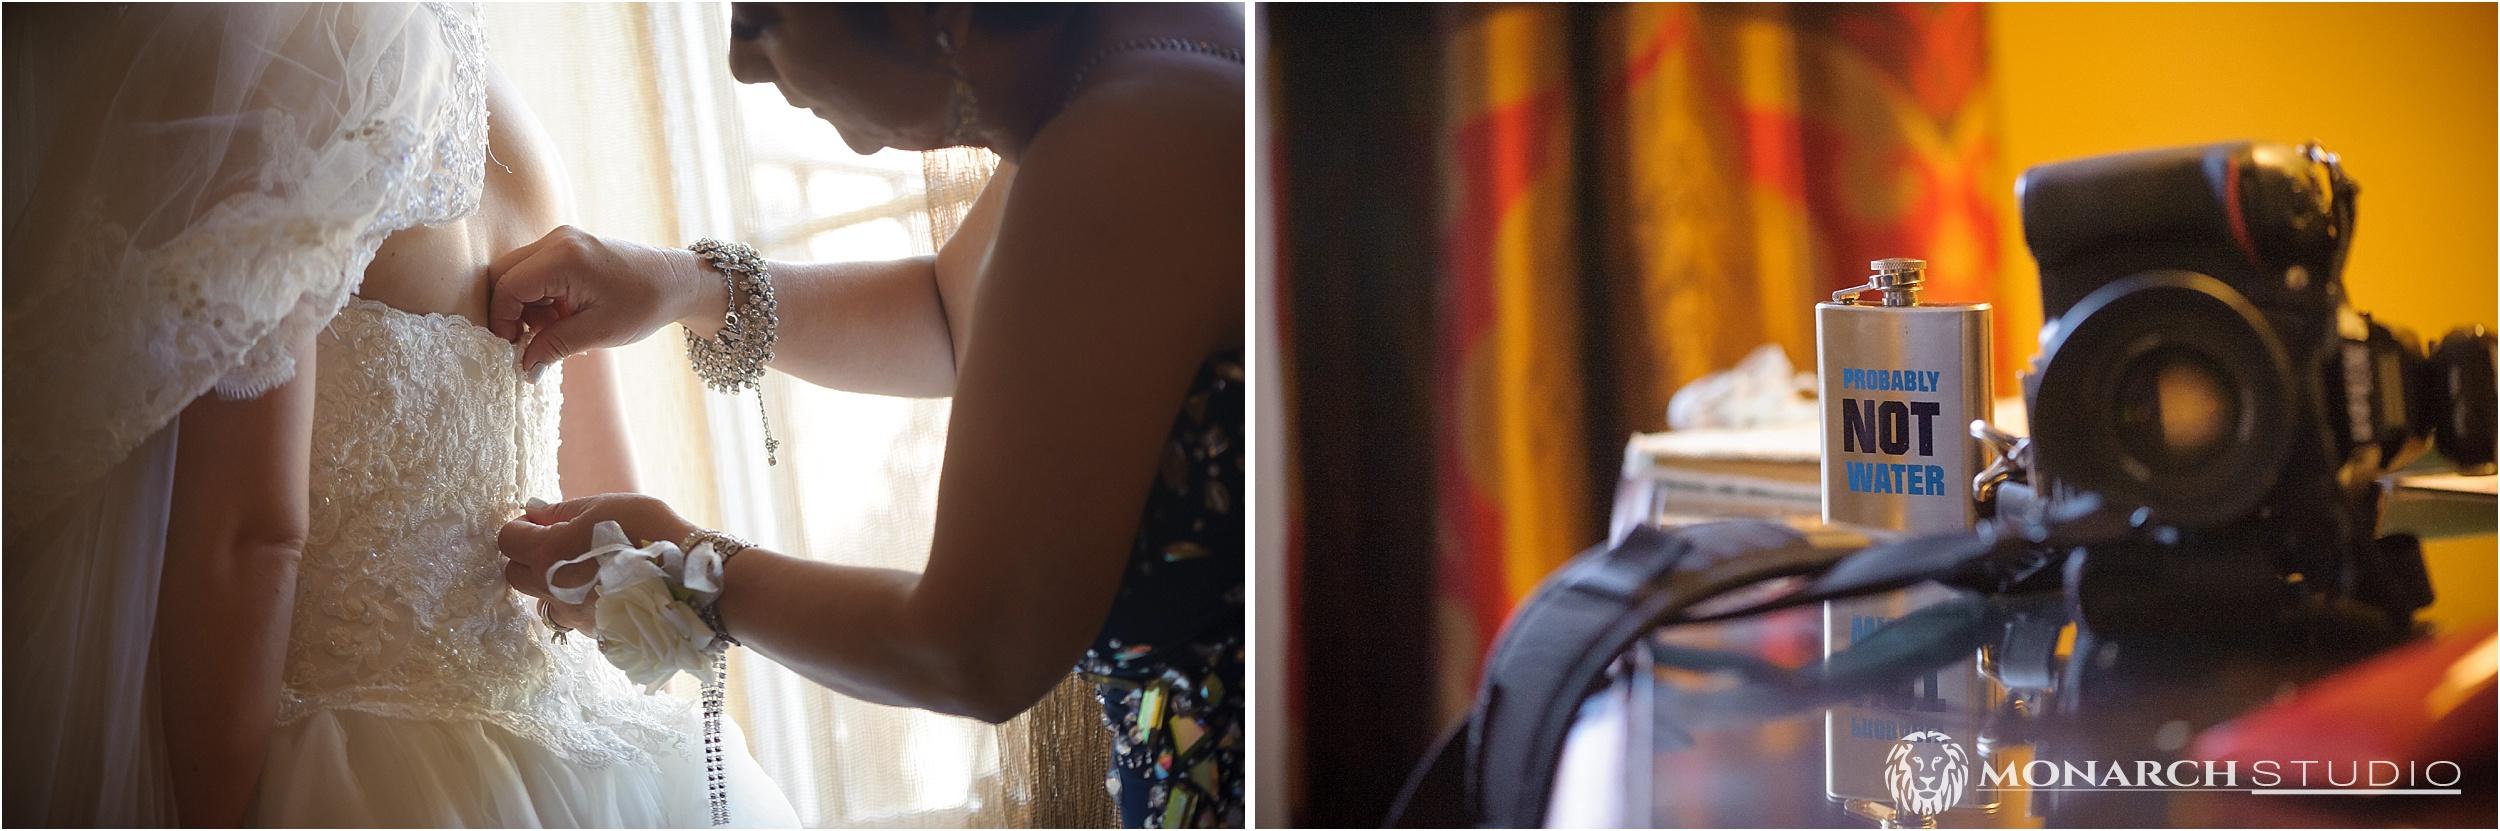 wedding-photographer-in-st-augustine-florida-treasury-011.jpg